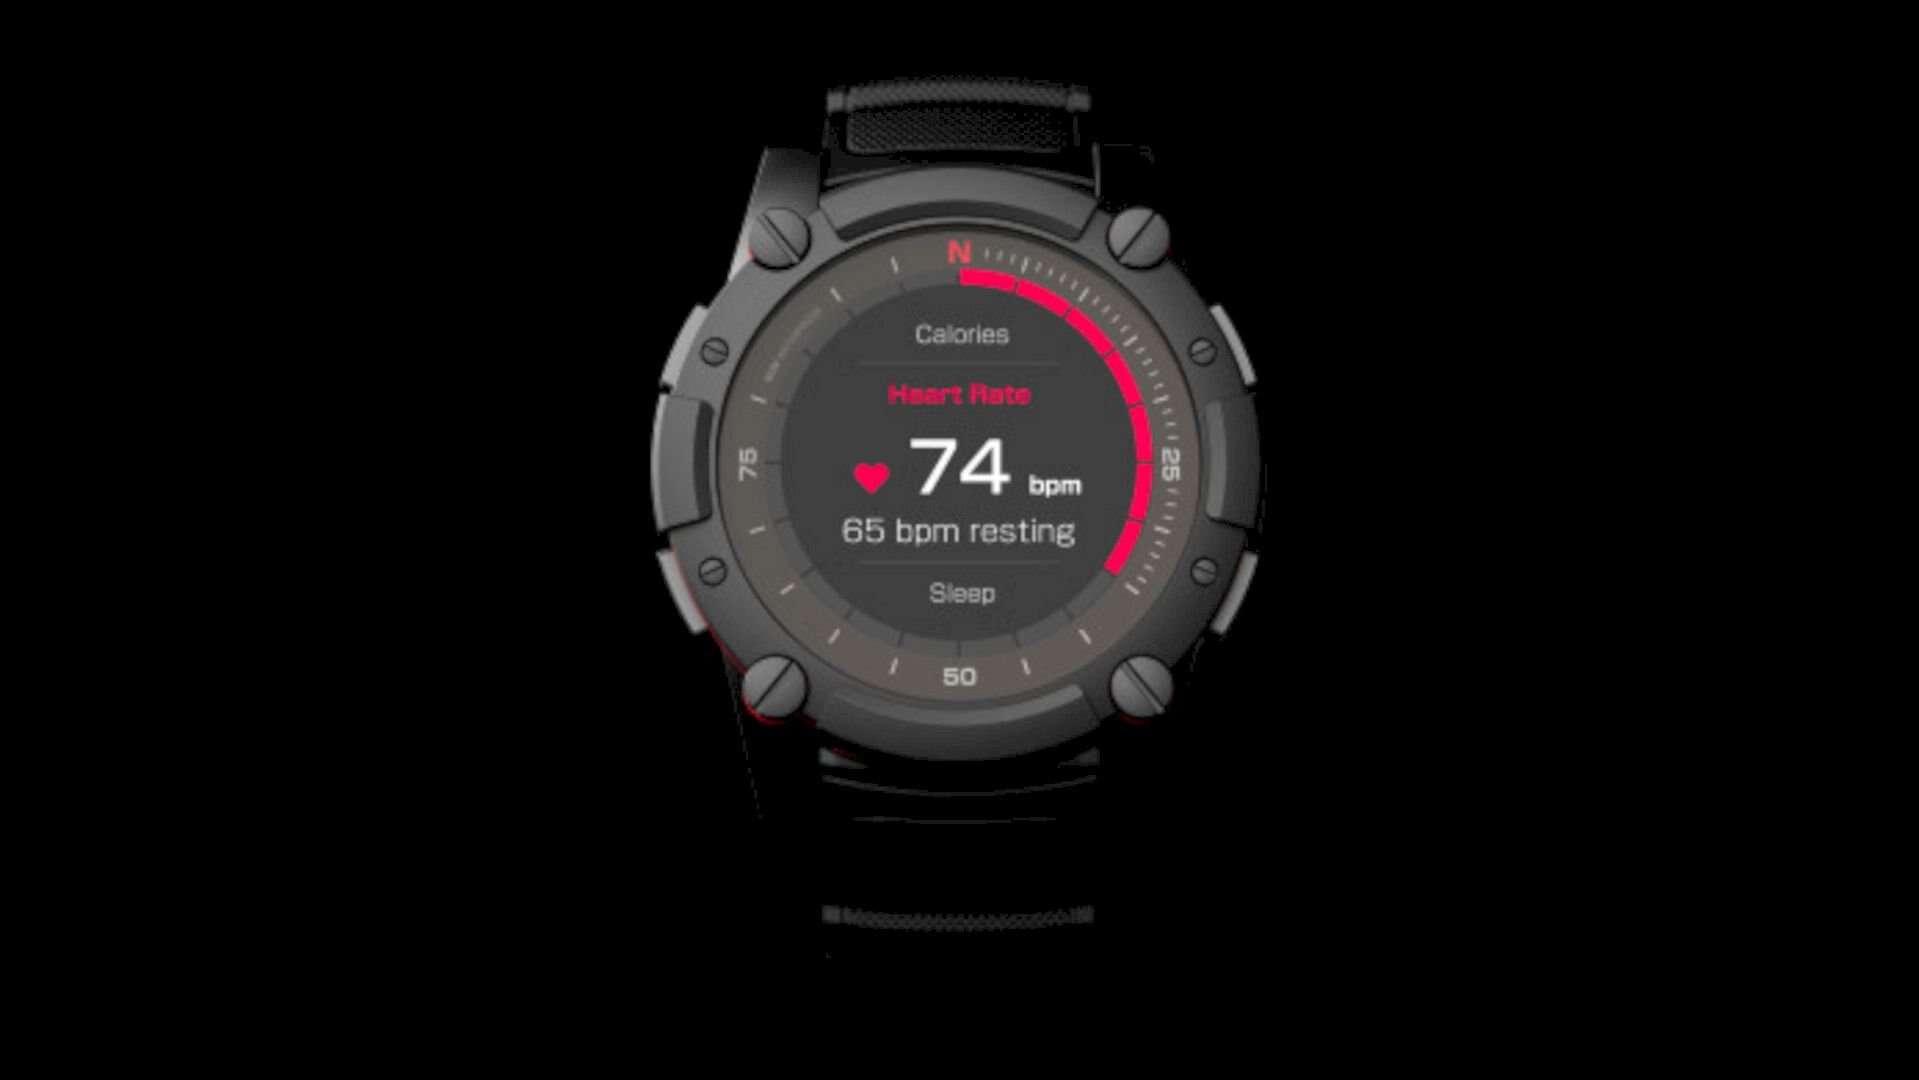 Matrix Powerwatch 2 6